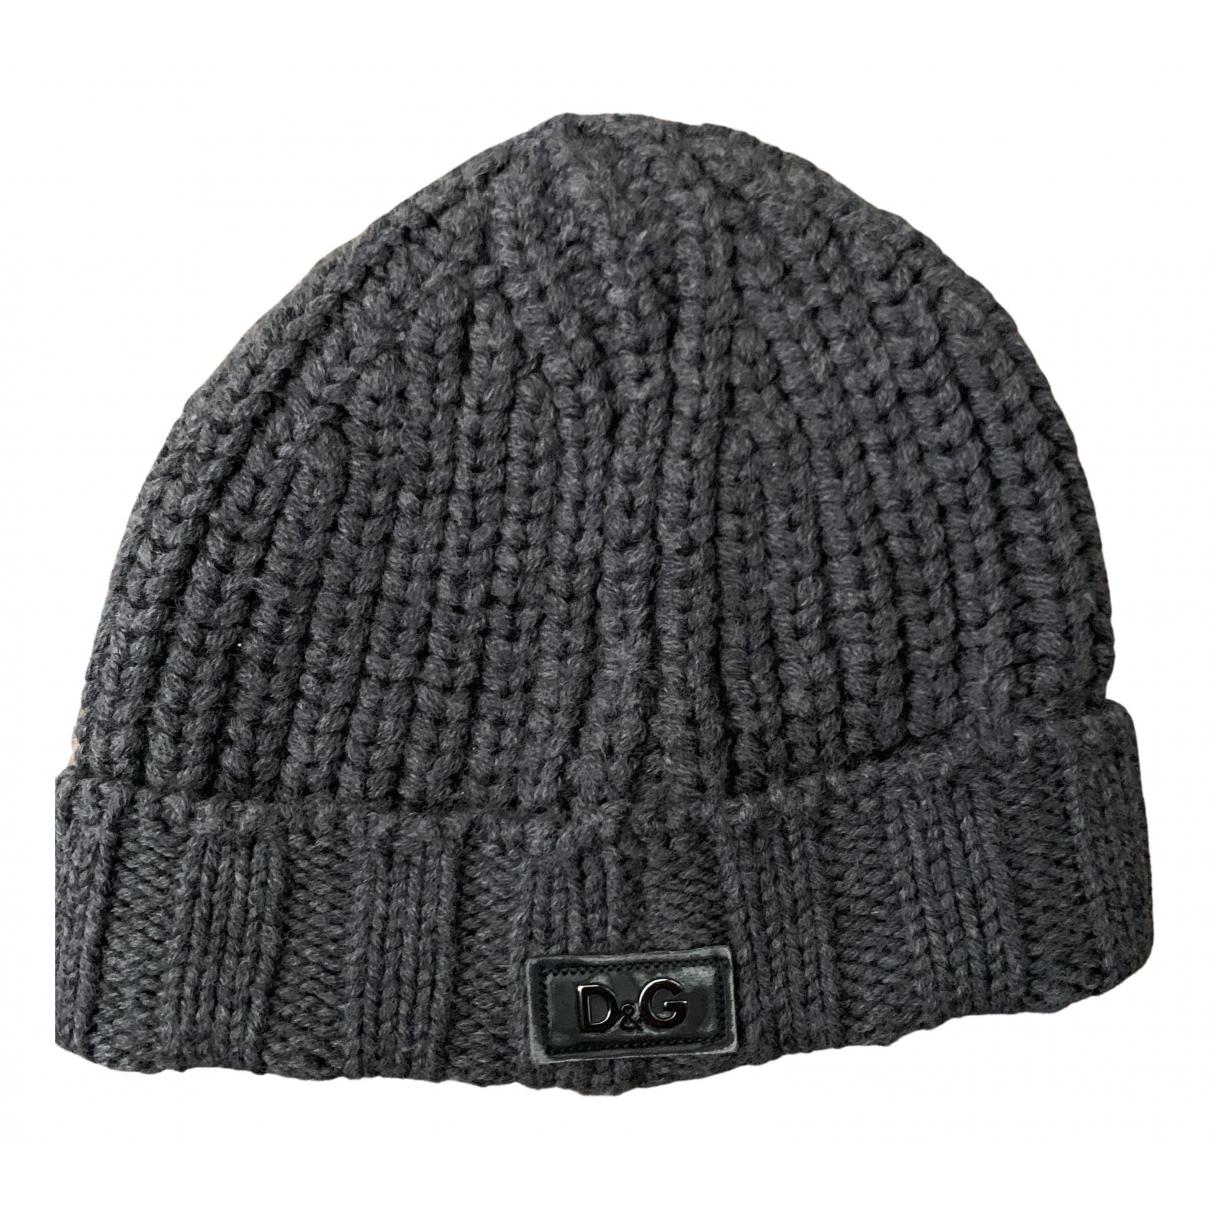 D&g N Grey Wool hat & pull on hat for Men L International